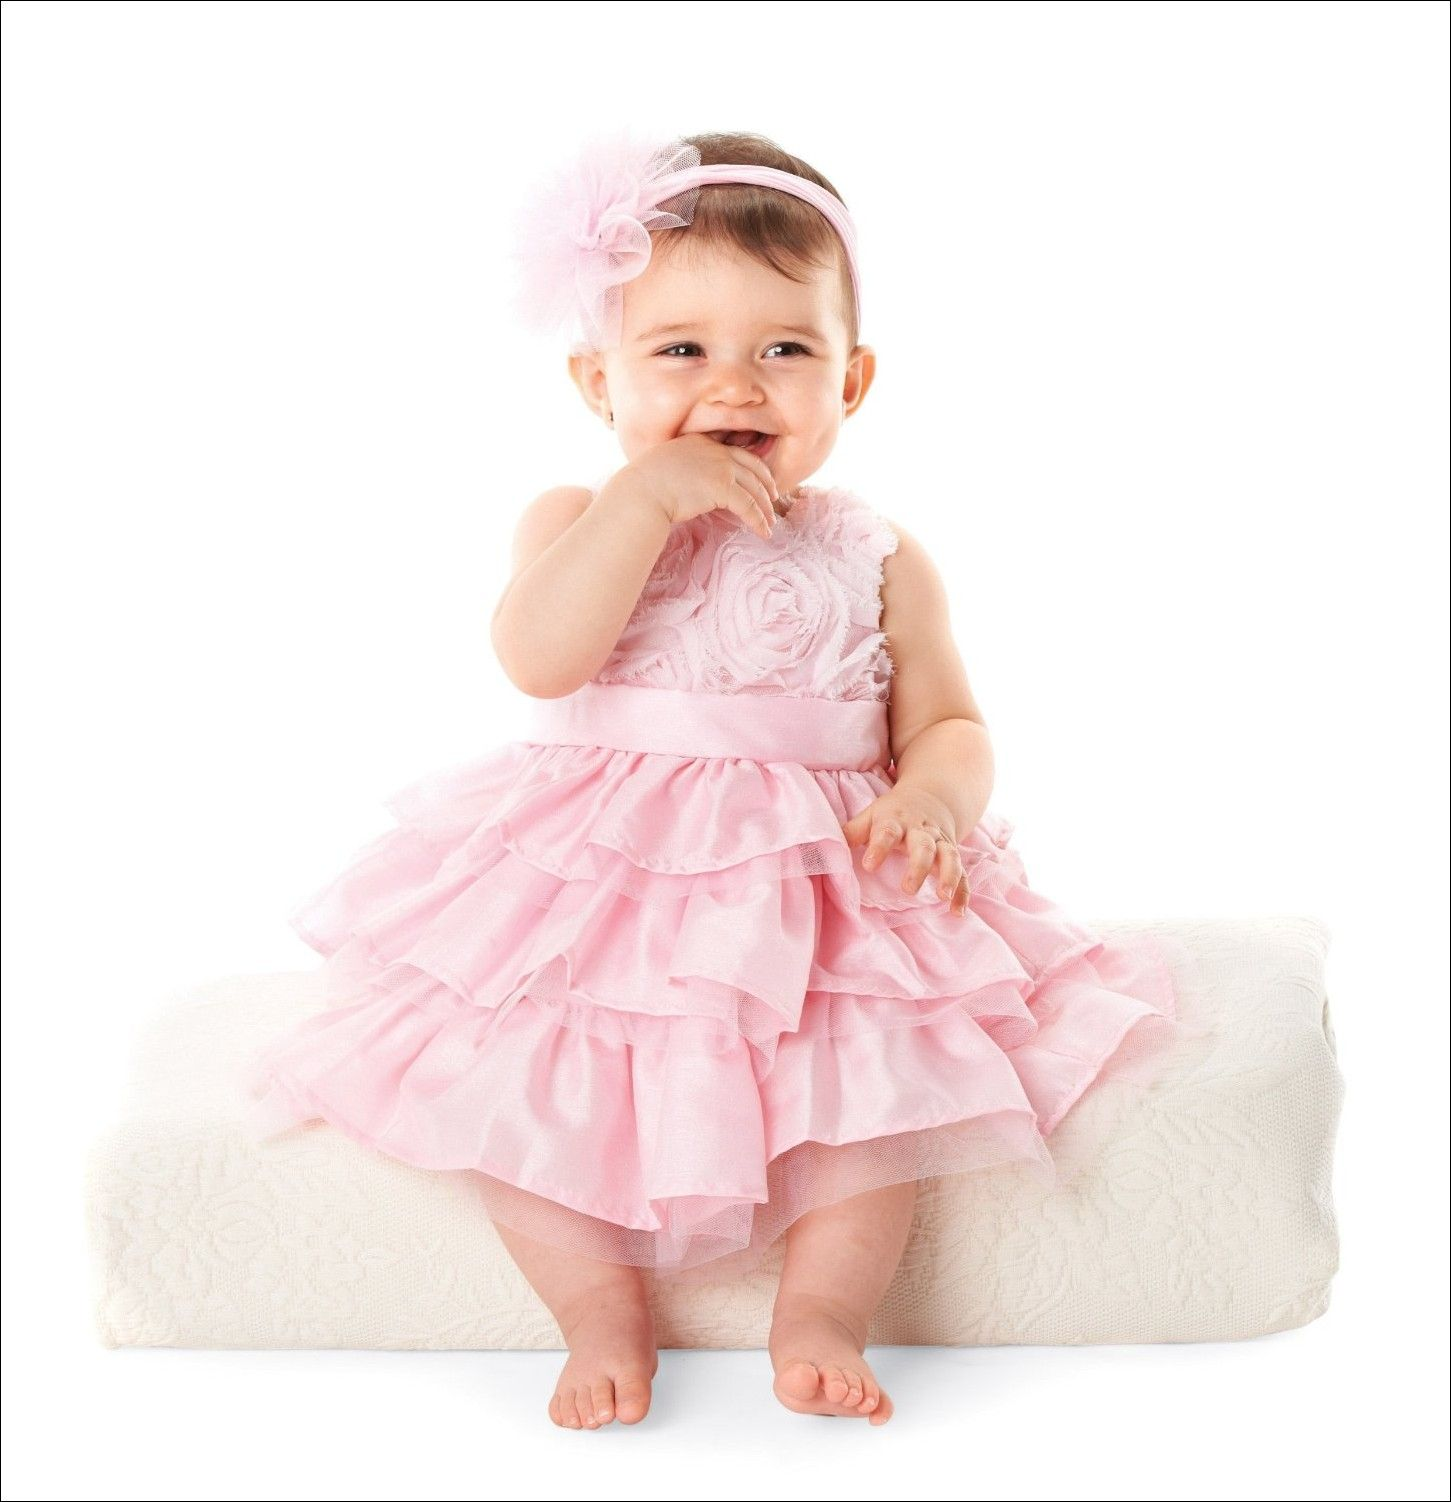 Kids Pink Bridesmaid Dresses - Top 50 Junior and Childrens ...